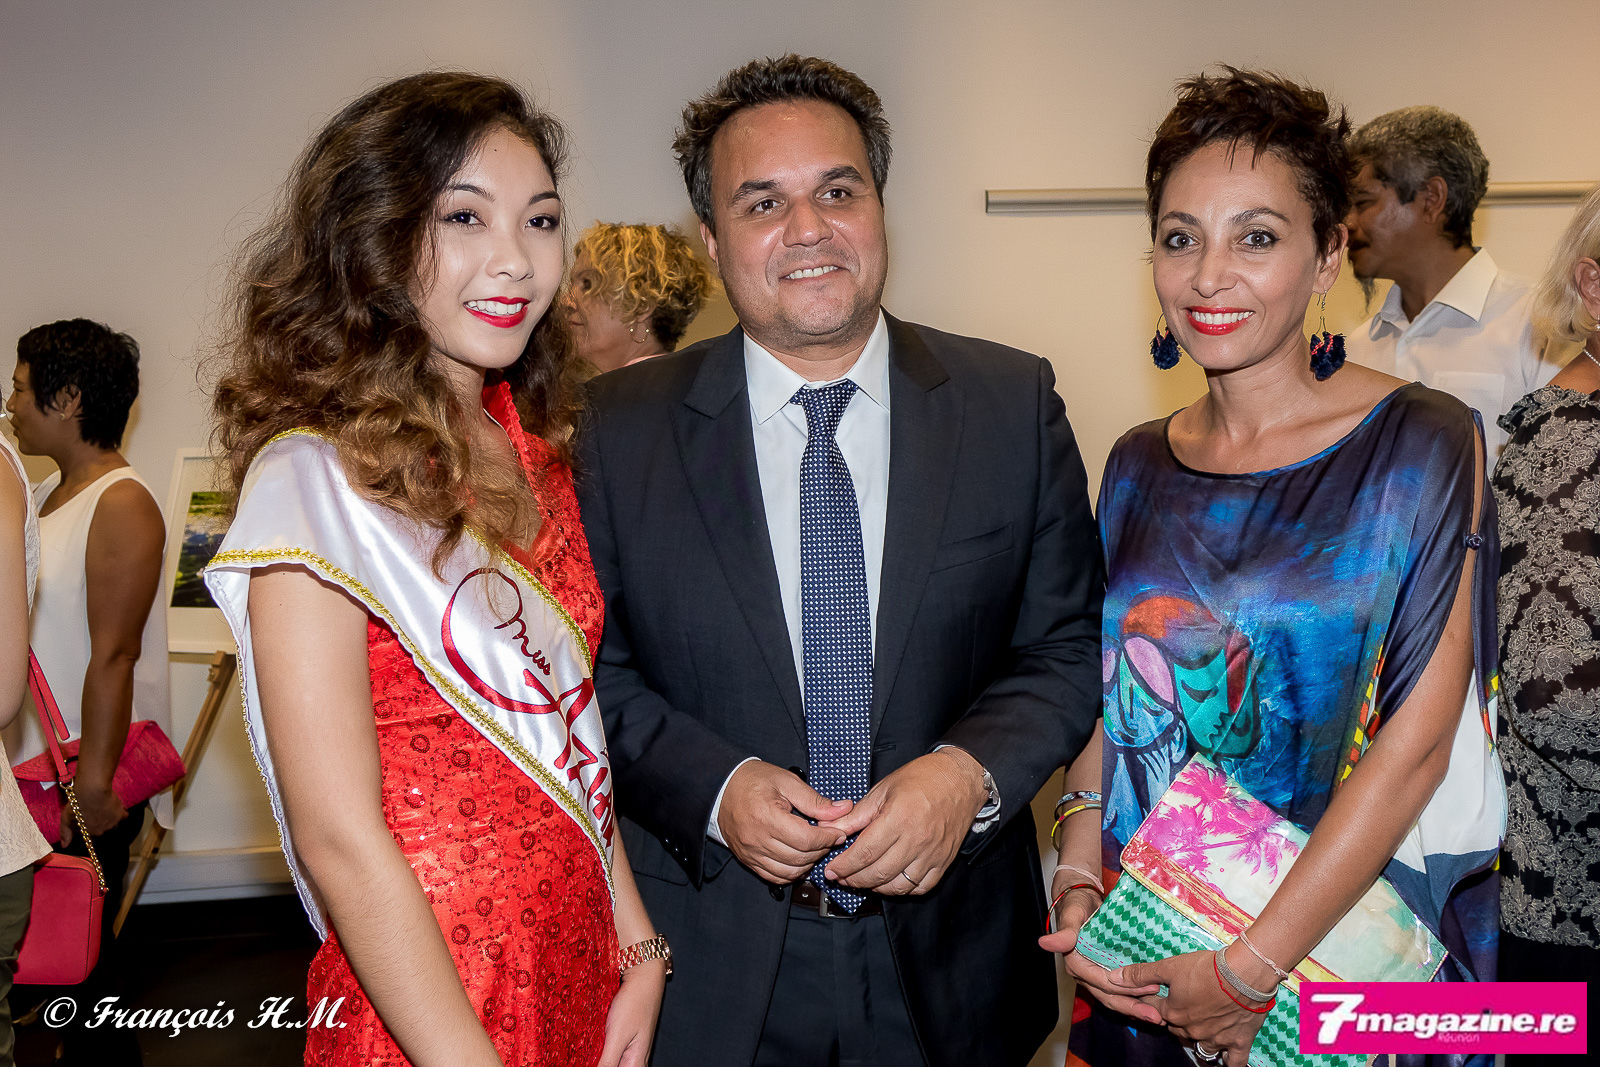 Manon Lio Soon Shun, Didier et Corine Robert